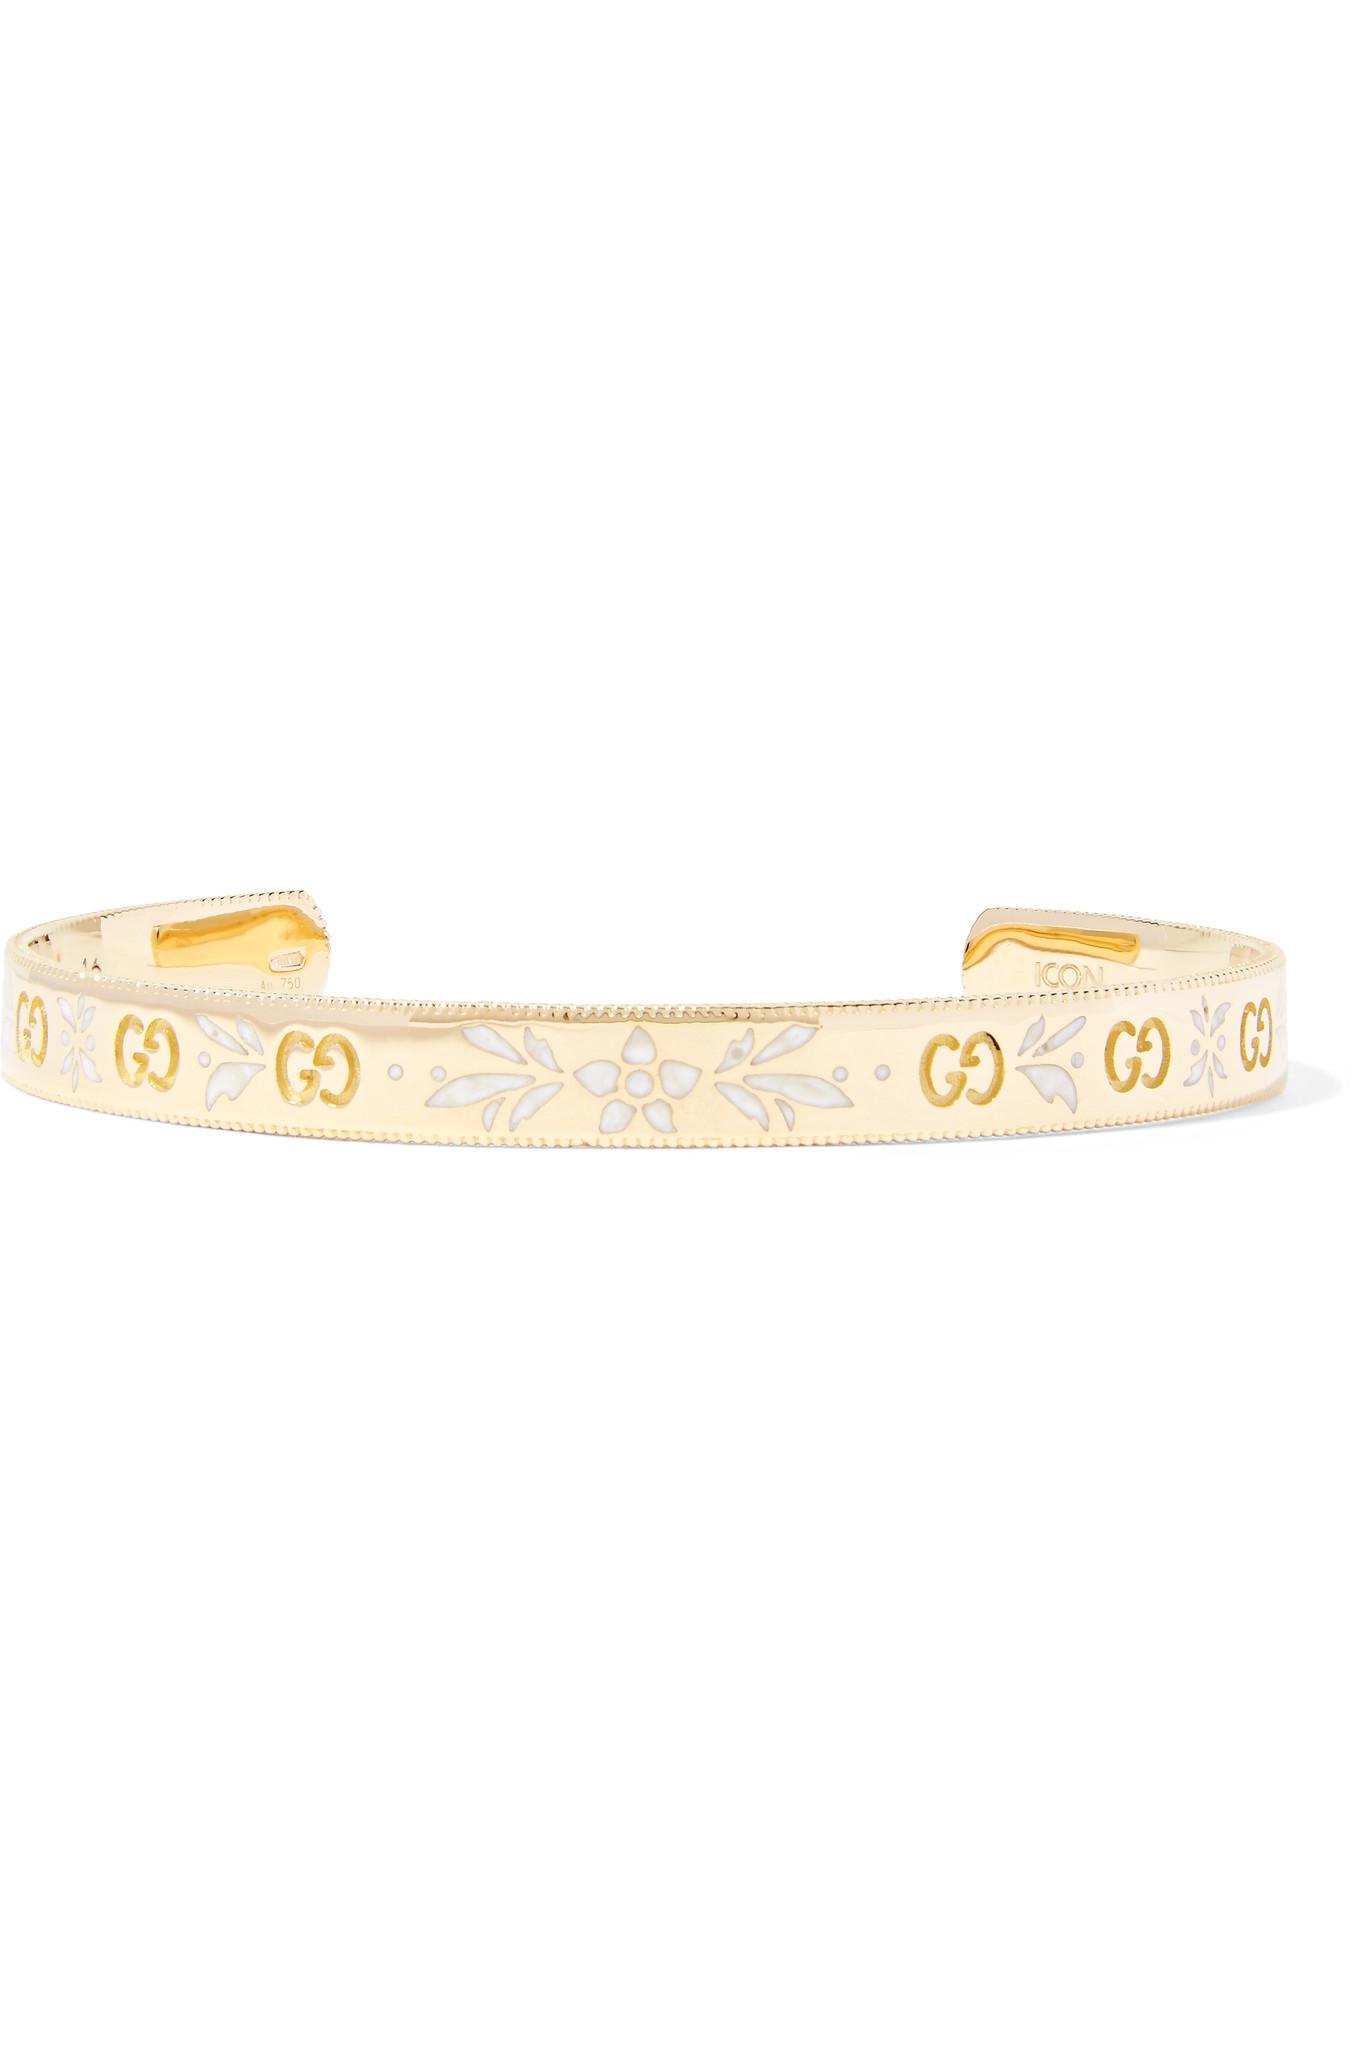 eac9b6084 Gucci Icon 18-karat Gold And Enamel Cuff in Metallic - Lyst